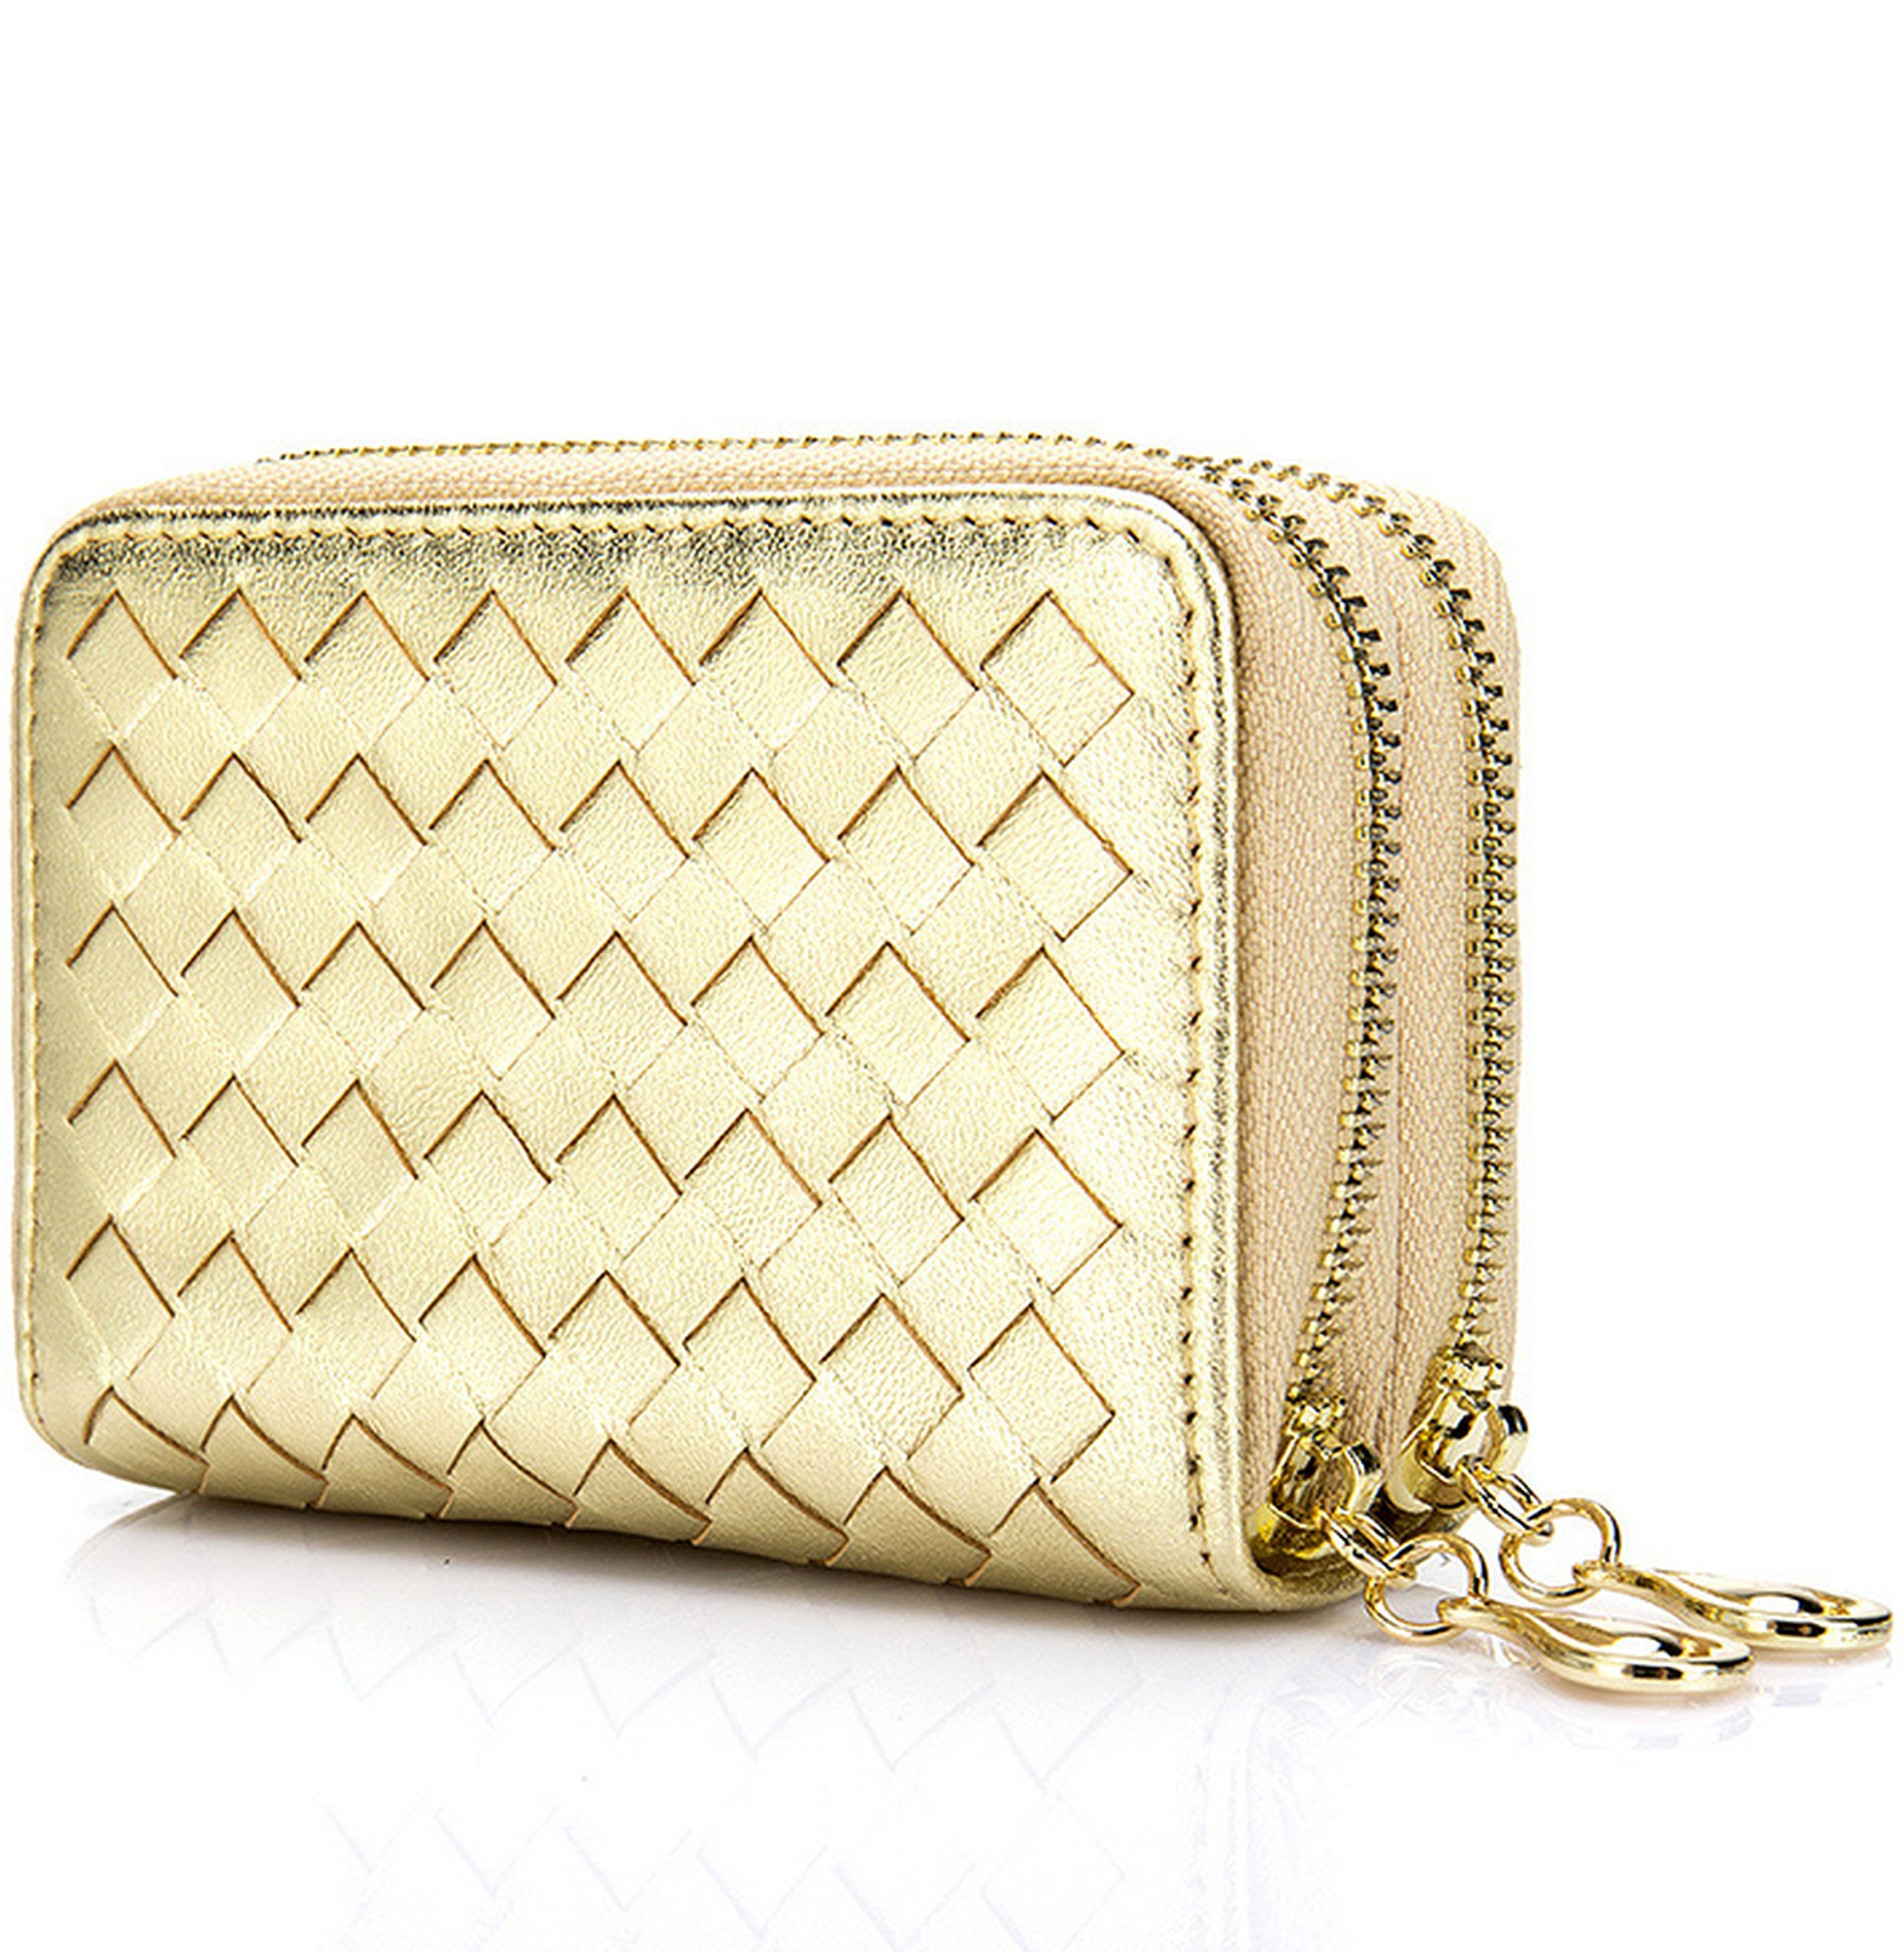 Women's RFID Blocking Leather Secure Credit Card Holder Zipper Wallet w Keychain, Gold, b6w009gd